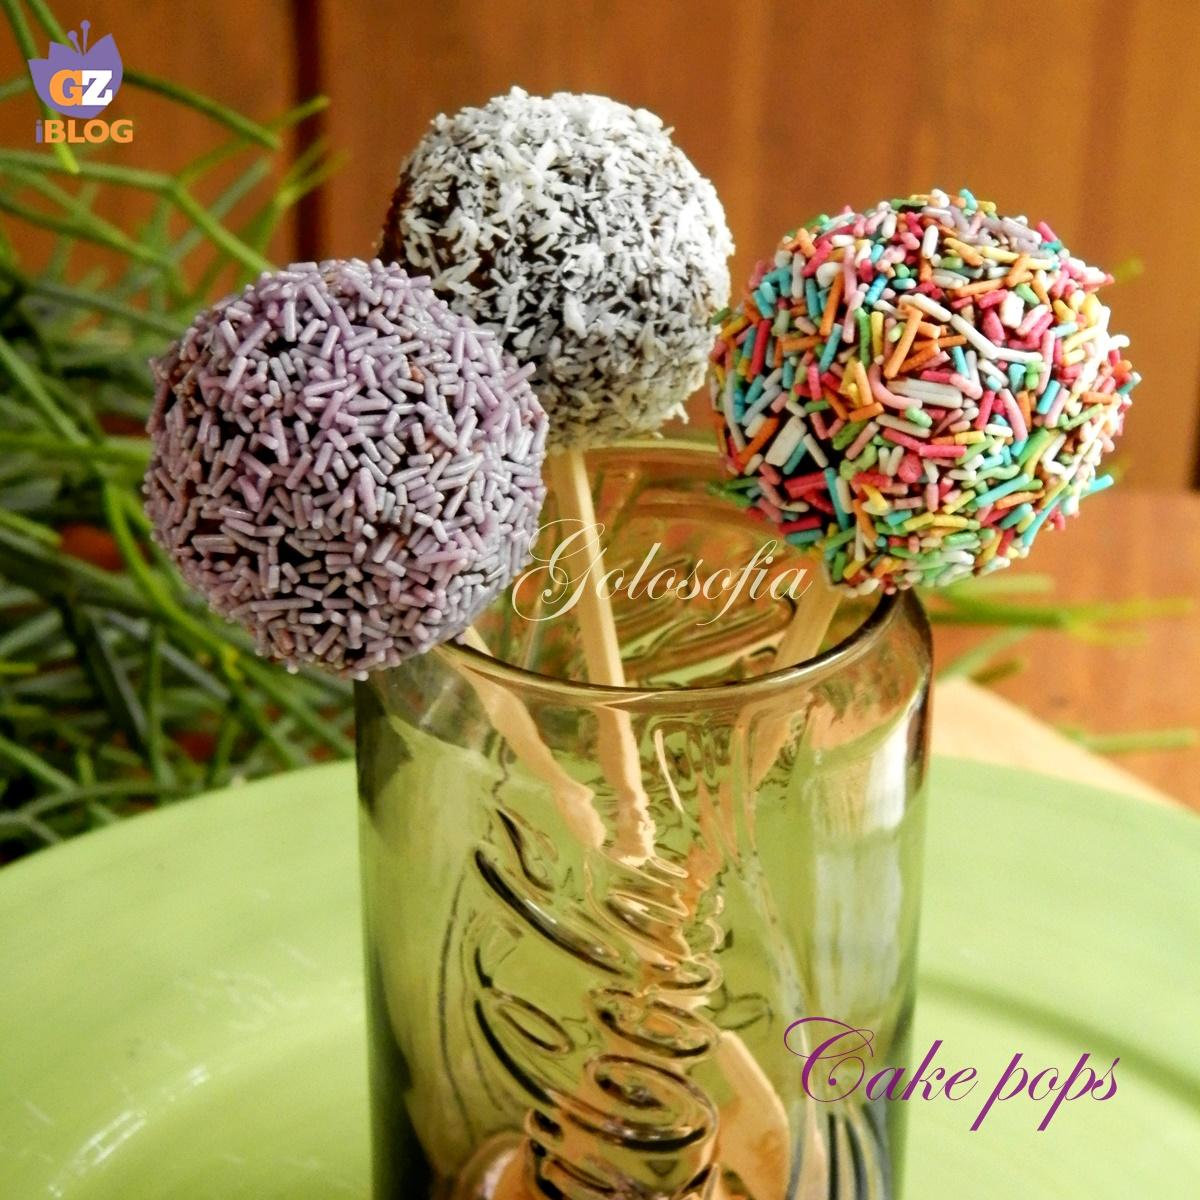 Cake pops-ricetta dolci-golosofia